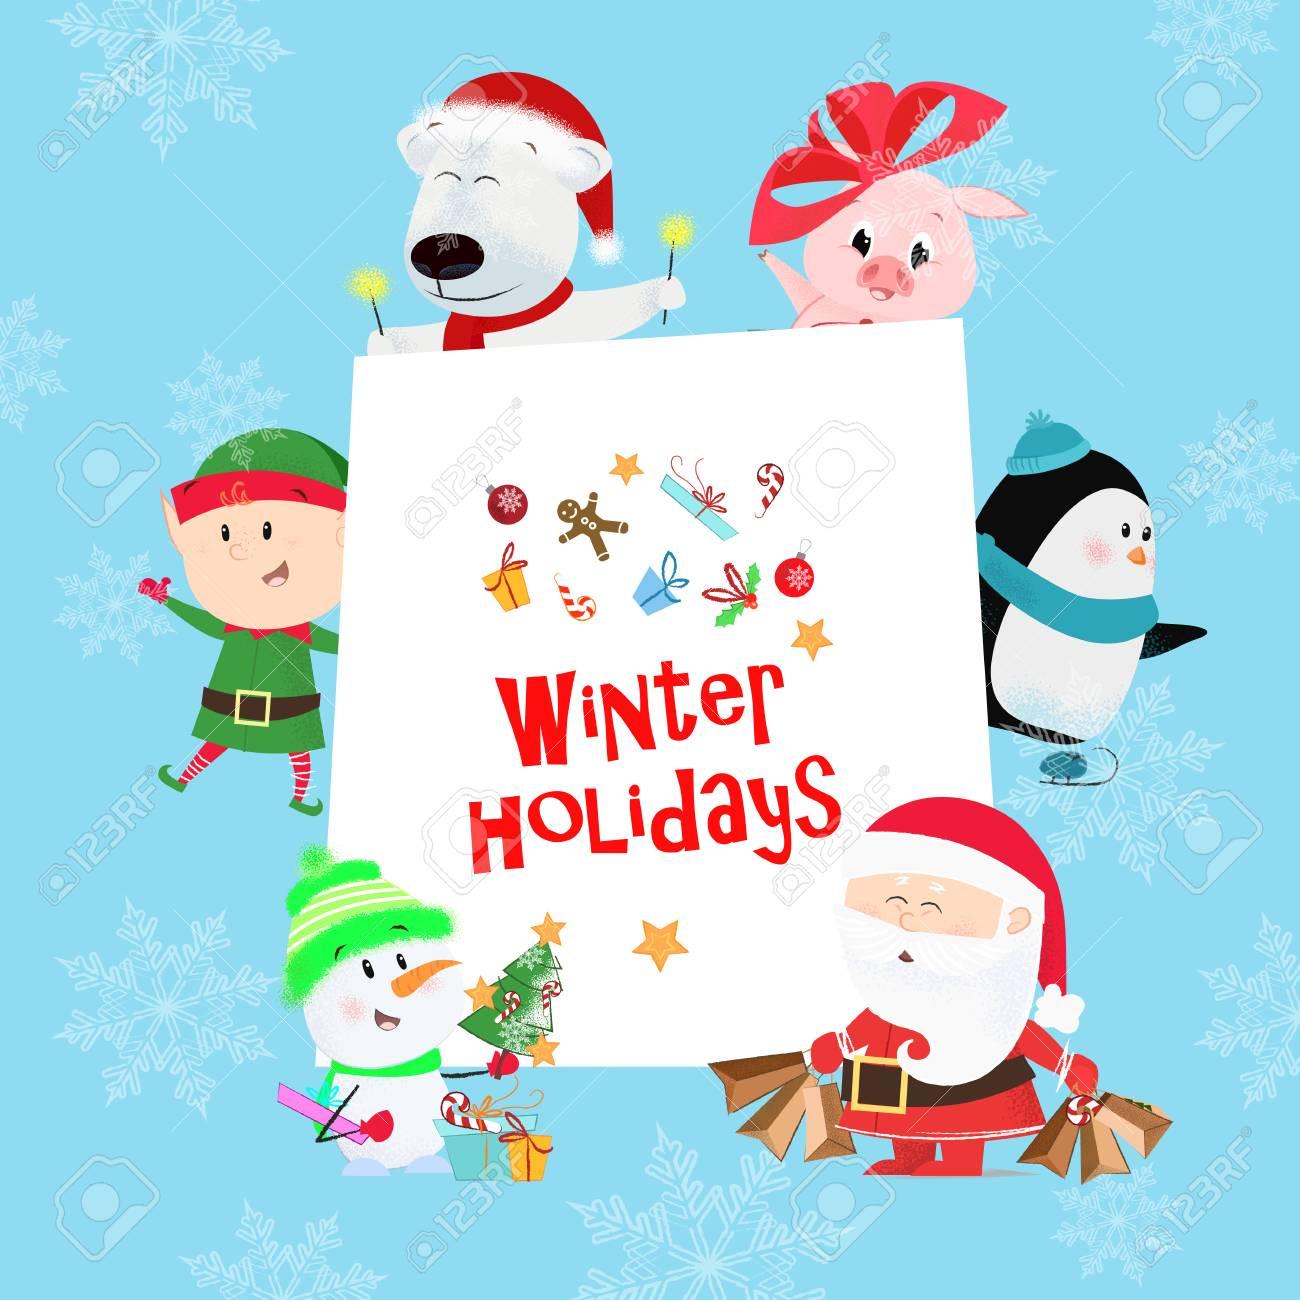 Santa Claus design christmas penguin snow snowflakes poinsettia christmas clip art holiday gift winter